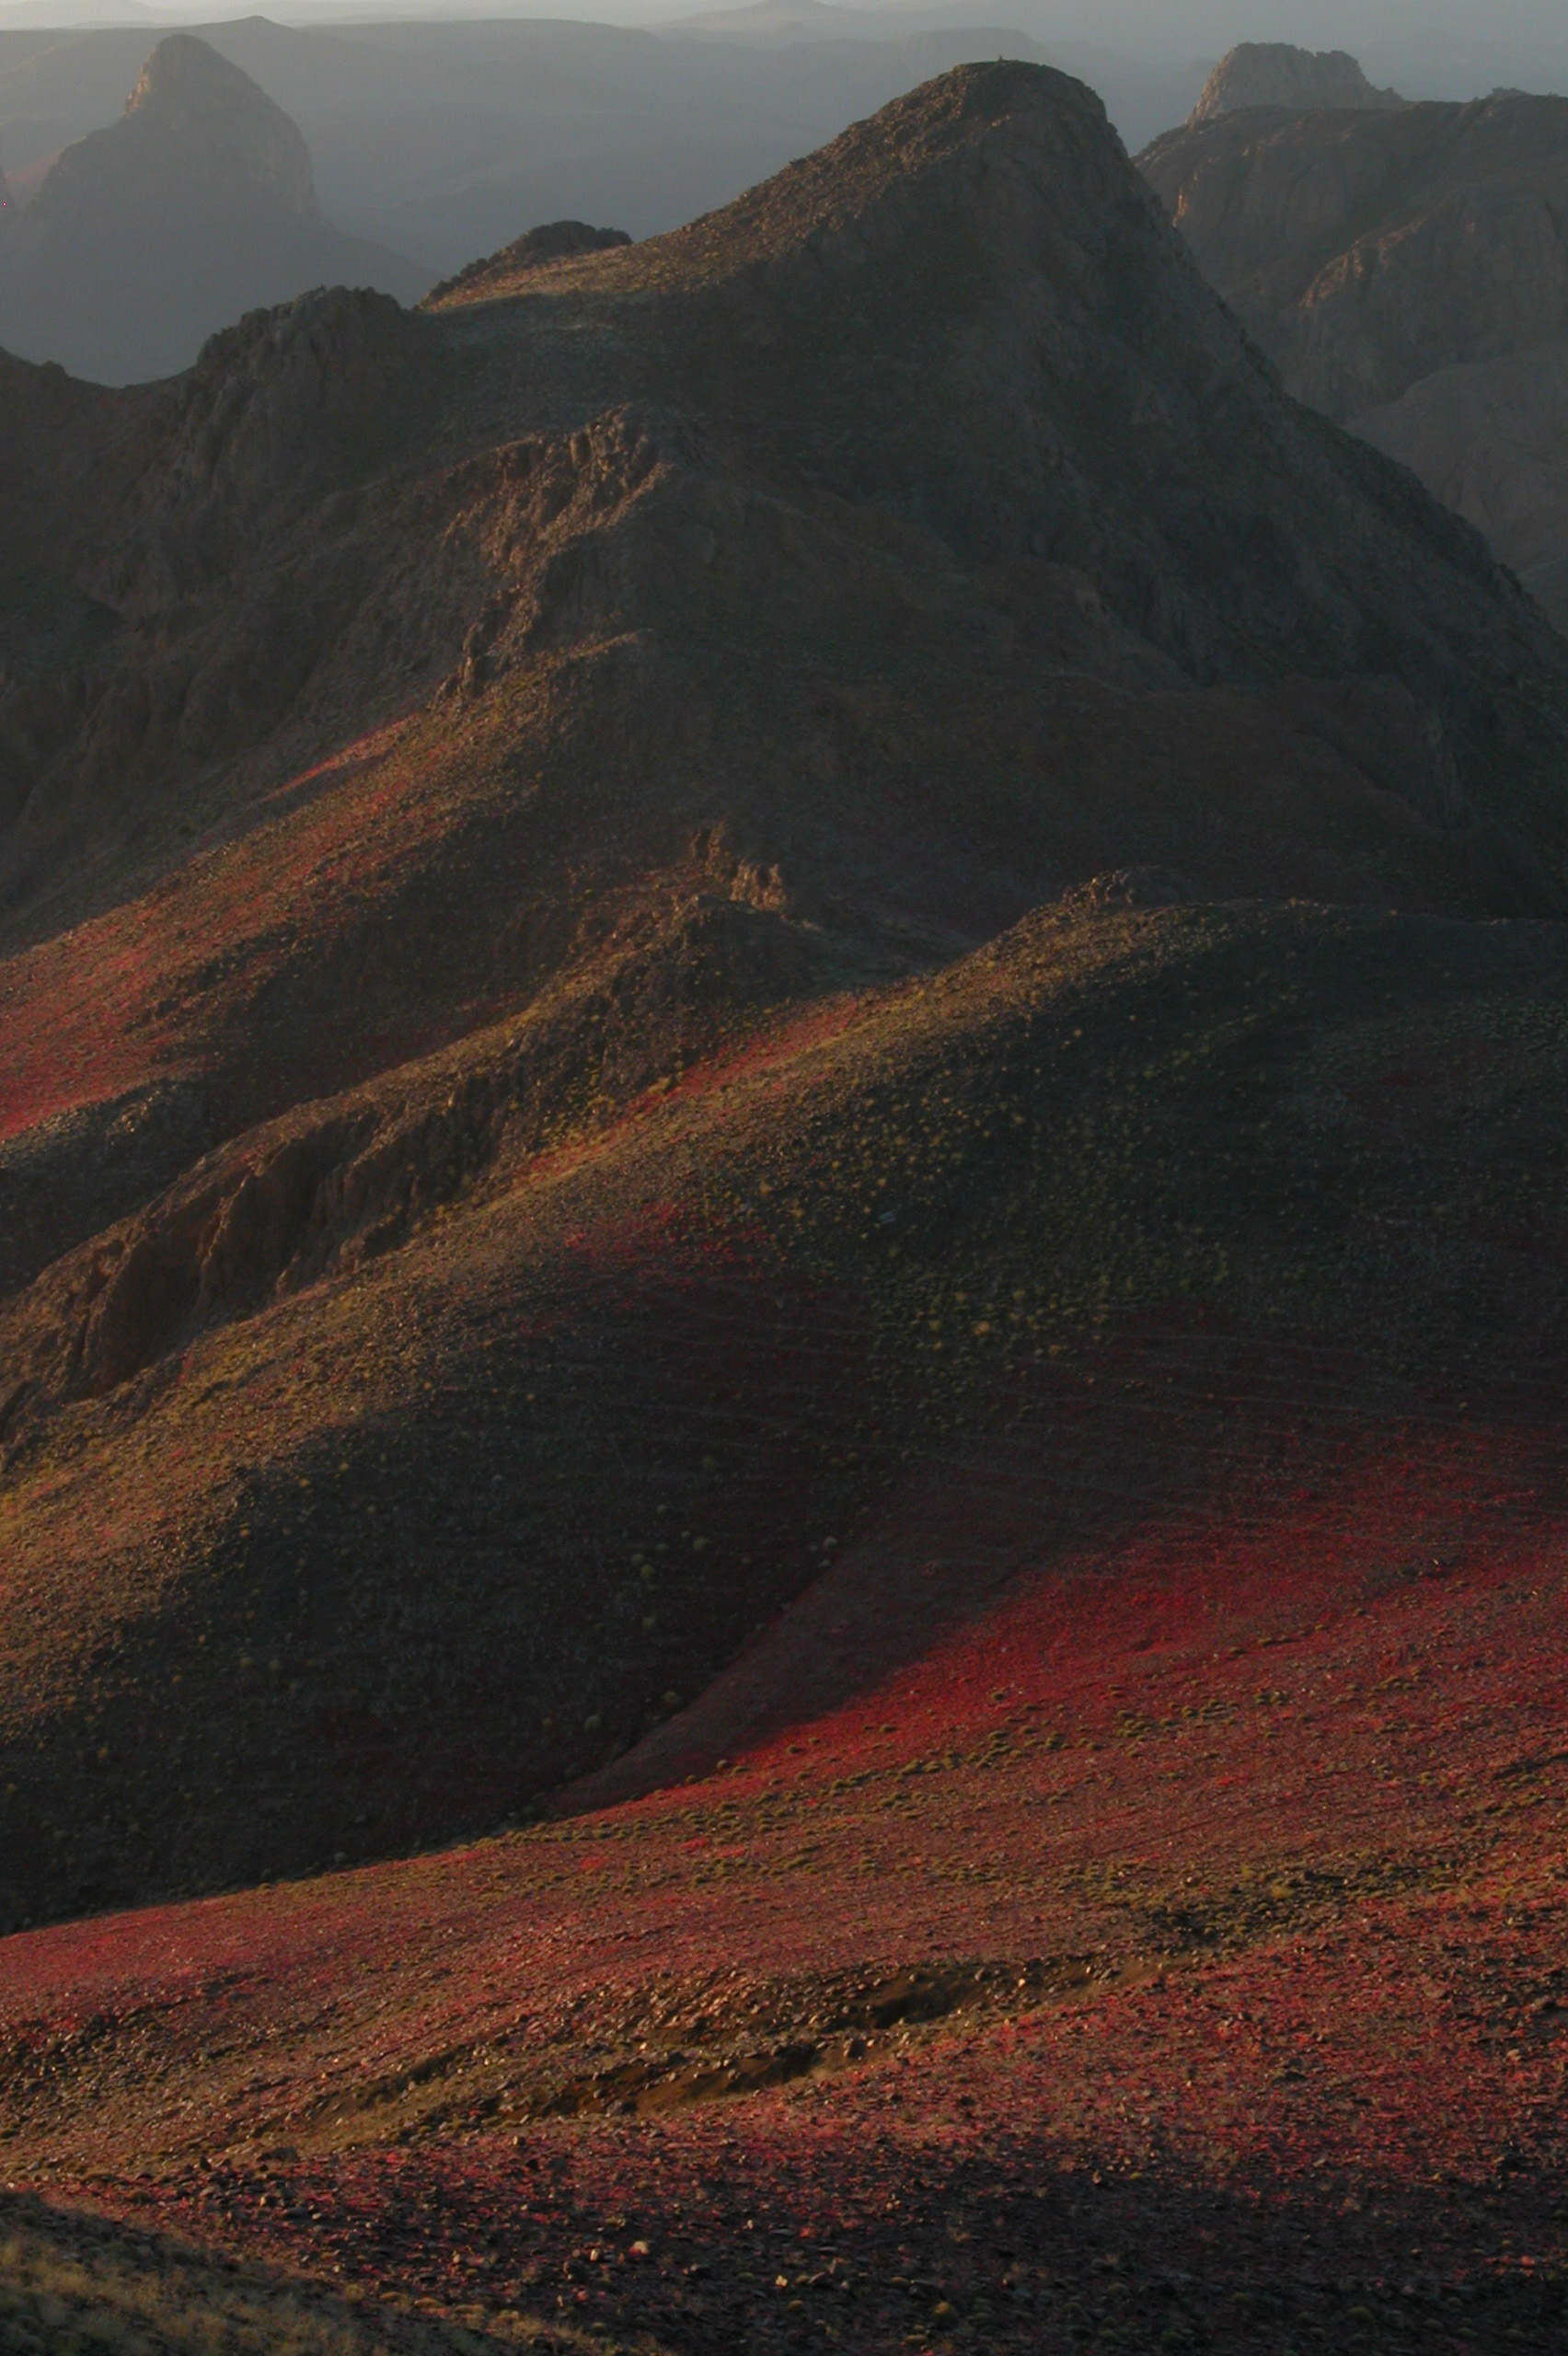 Algeria South, Hoggar Mountains, Flowers in the Hoggar Mountains, Walkopedia